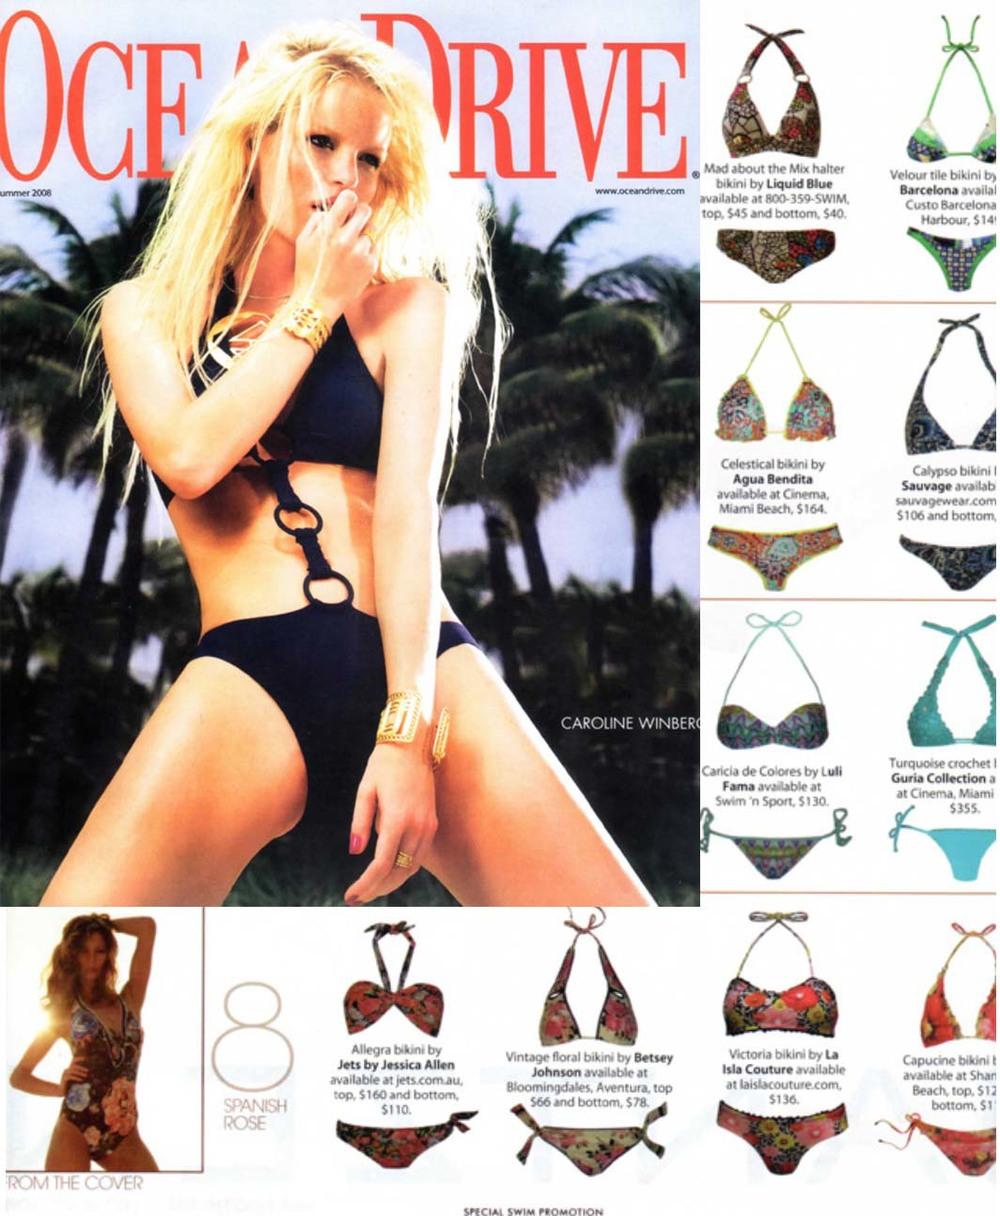 Ocean Drive Magazine. La Isla. New Floral Print Bikini.